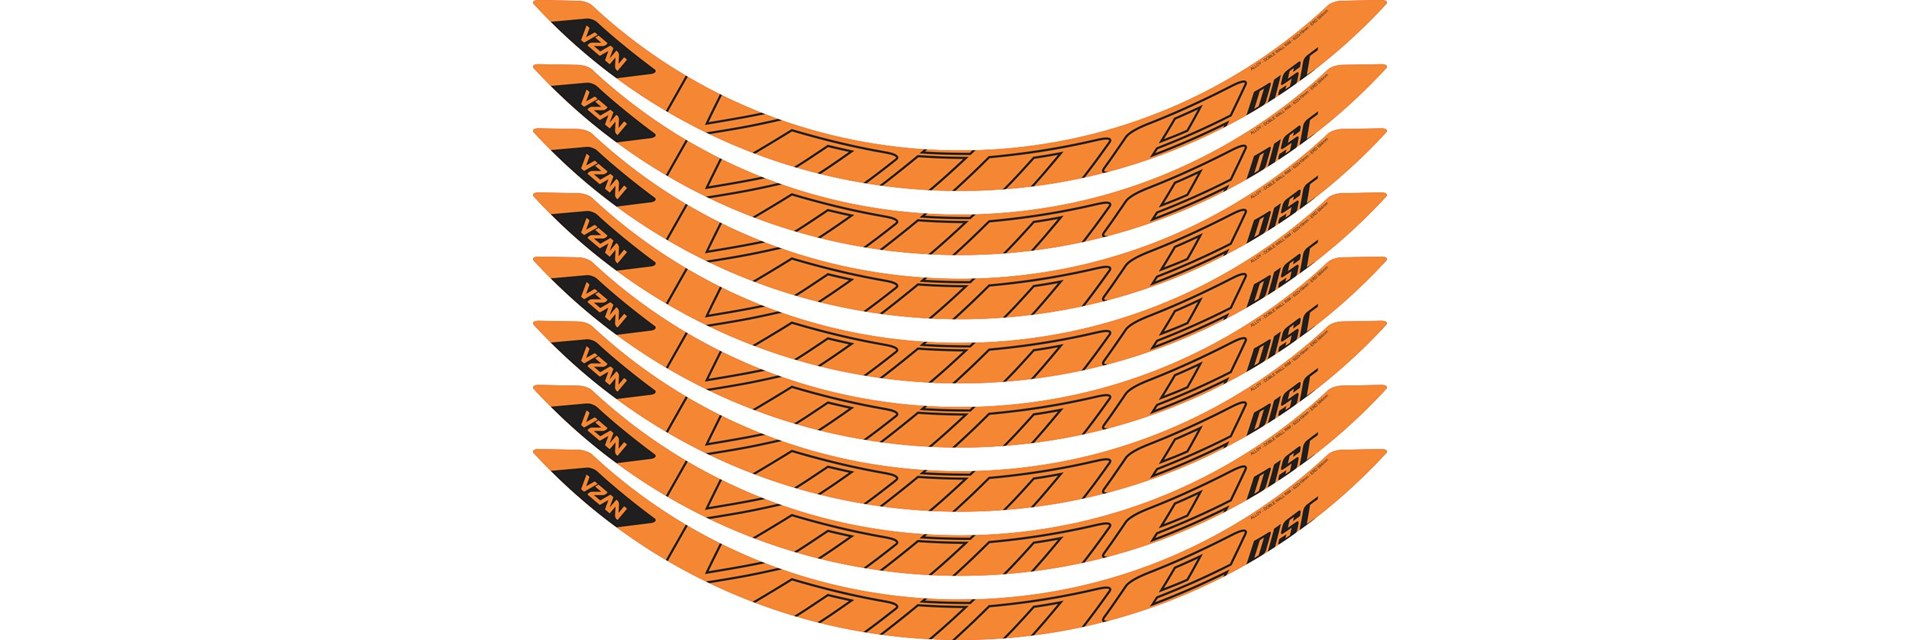 Adesivo Vnine 29 Disc Laranja Neon